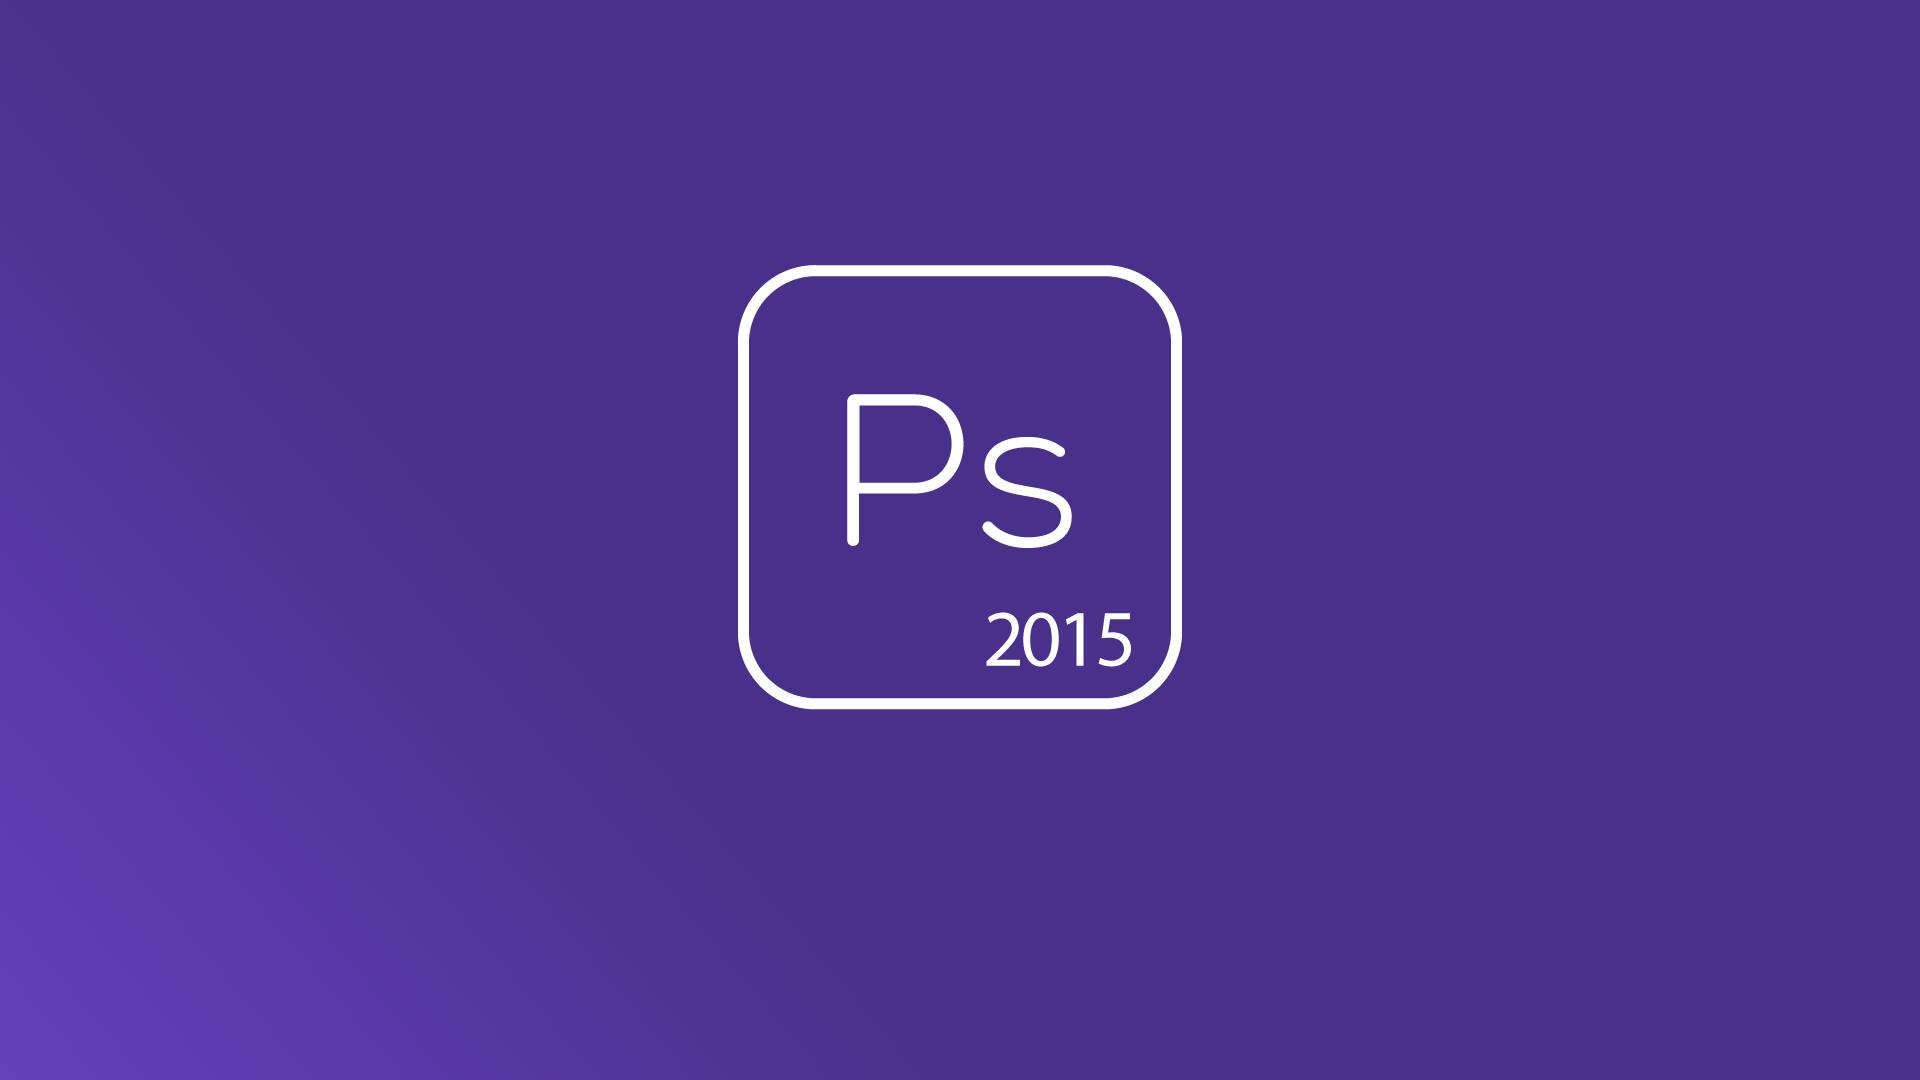 Photoshop Creative Cloud 2015